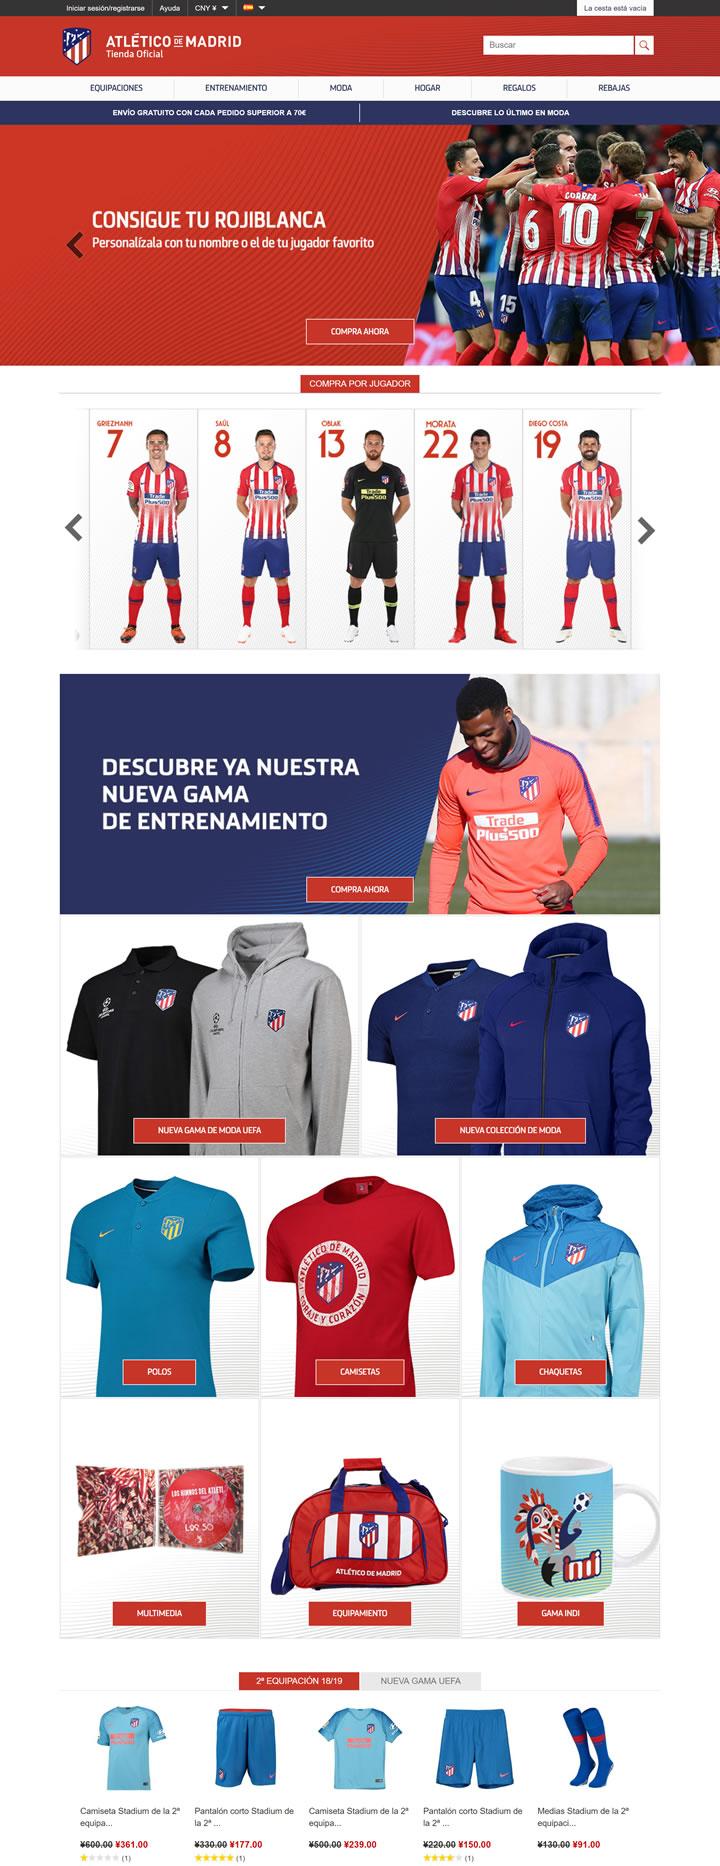 马德里竞技官方网上商店:Atletico Madrid Shop